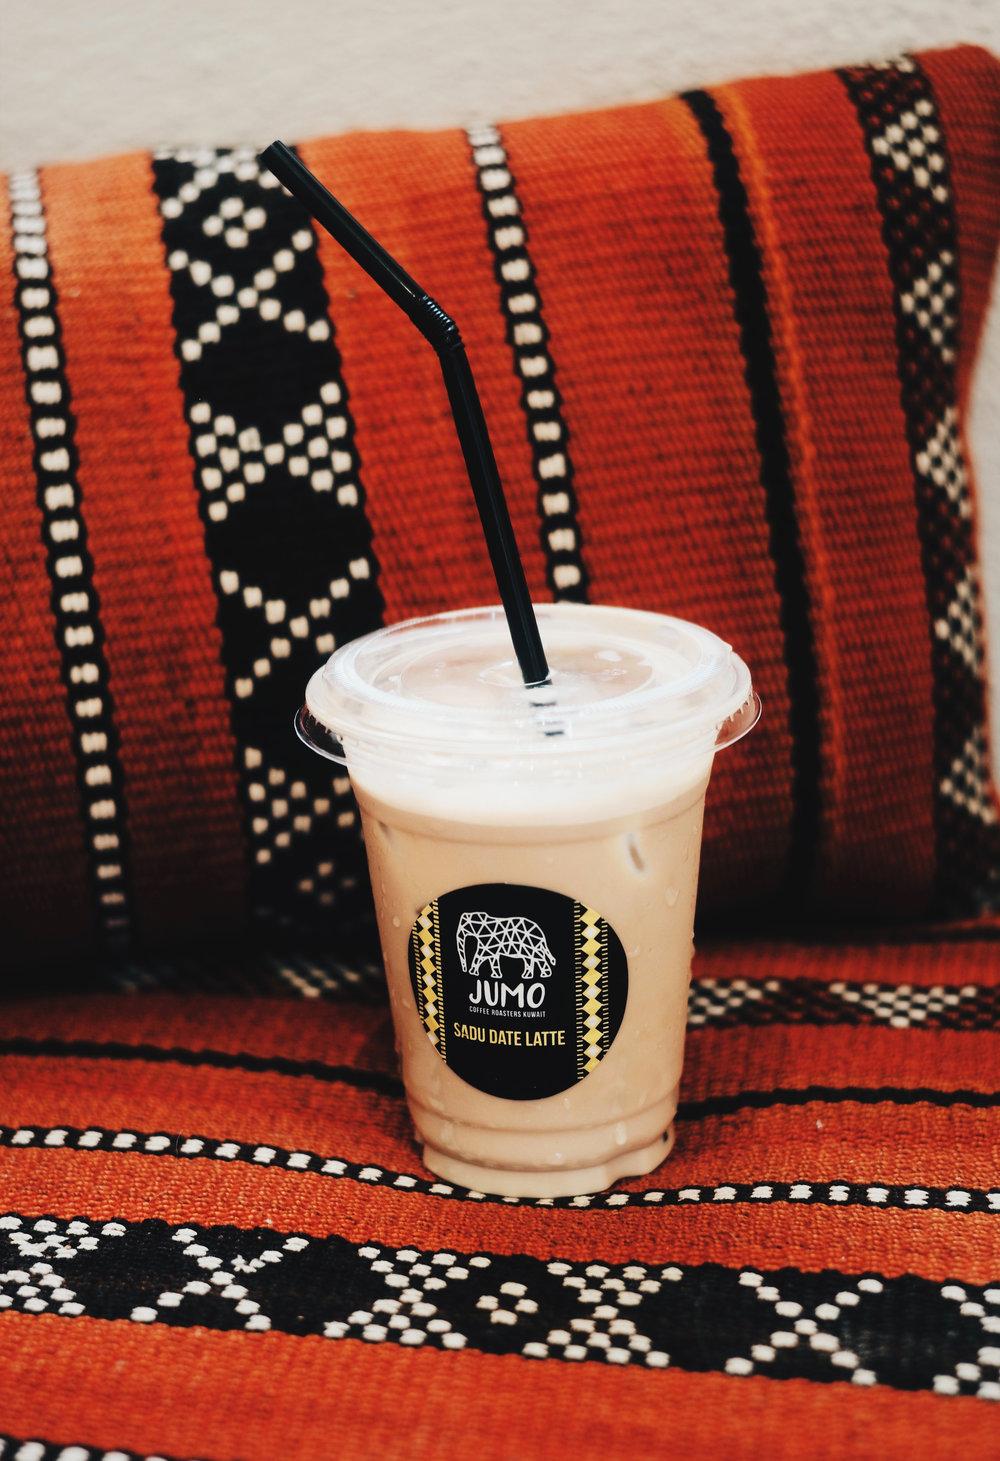 sadu date latte